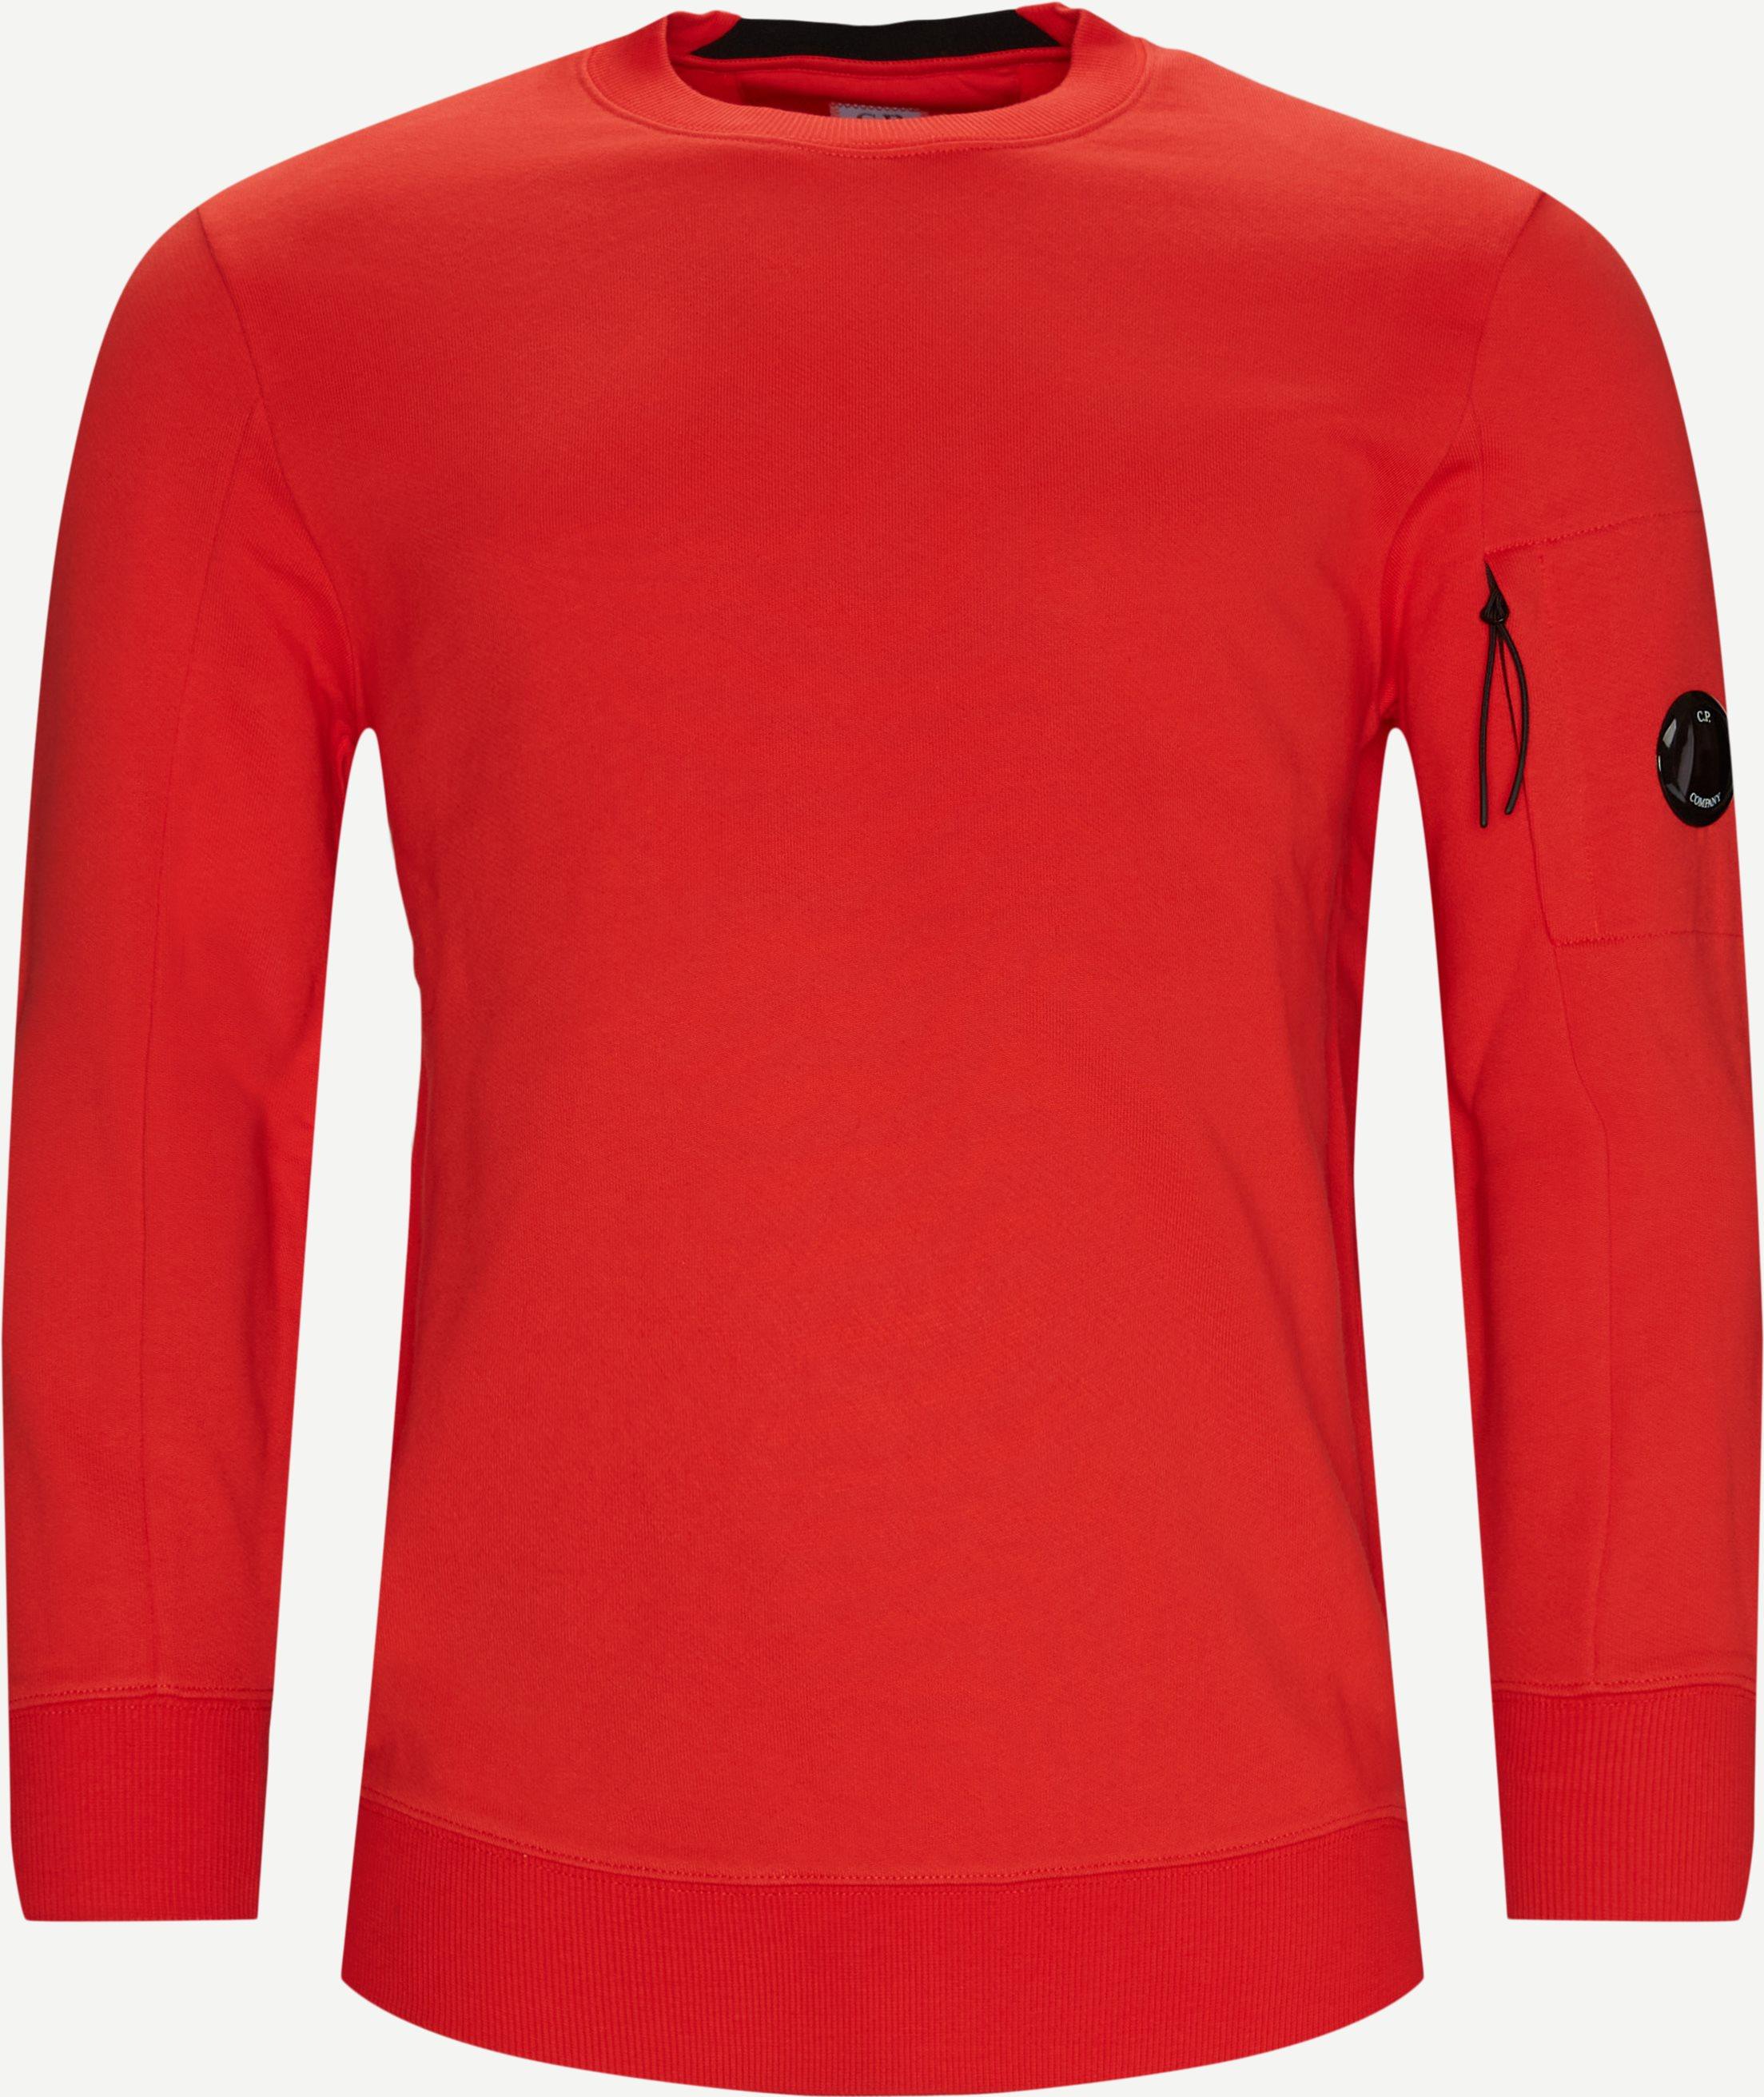 Sweatshirts - Regular fit - Röd